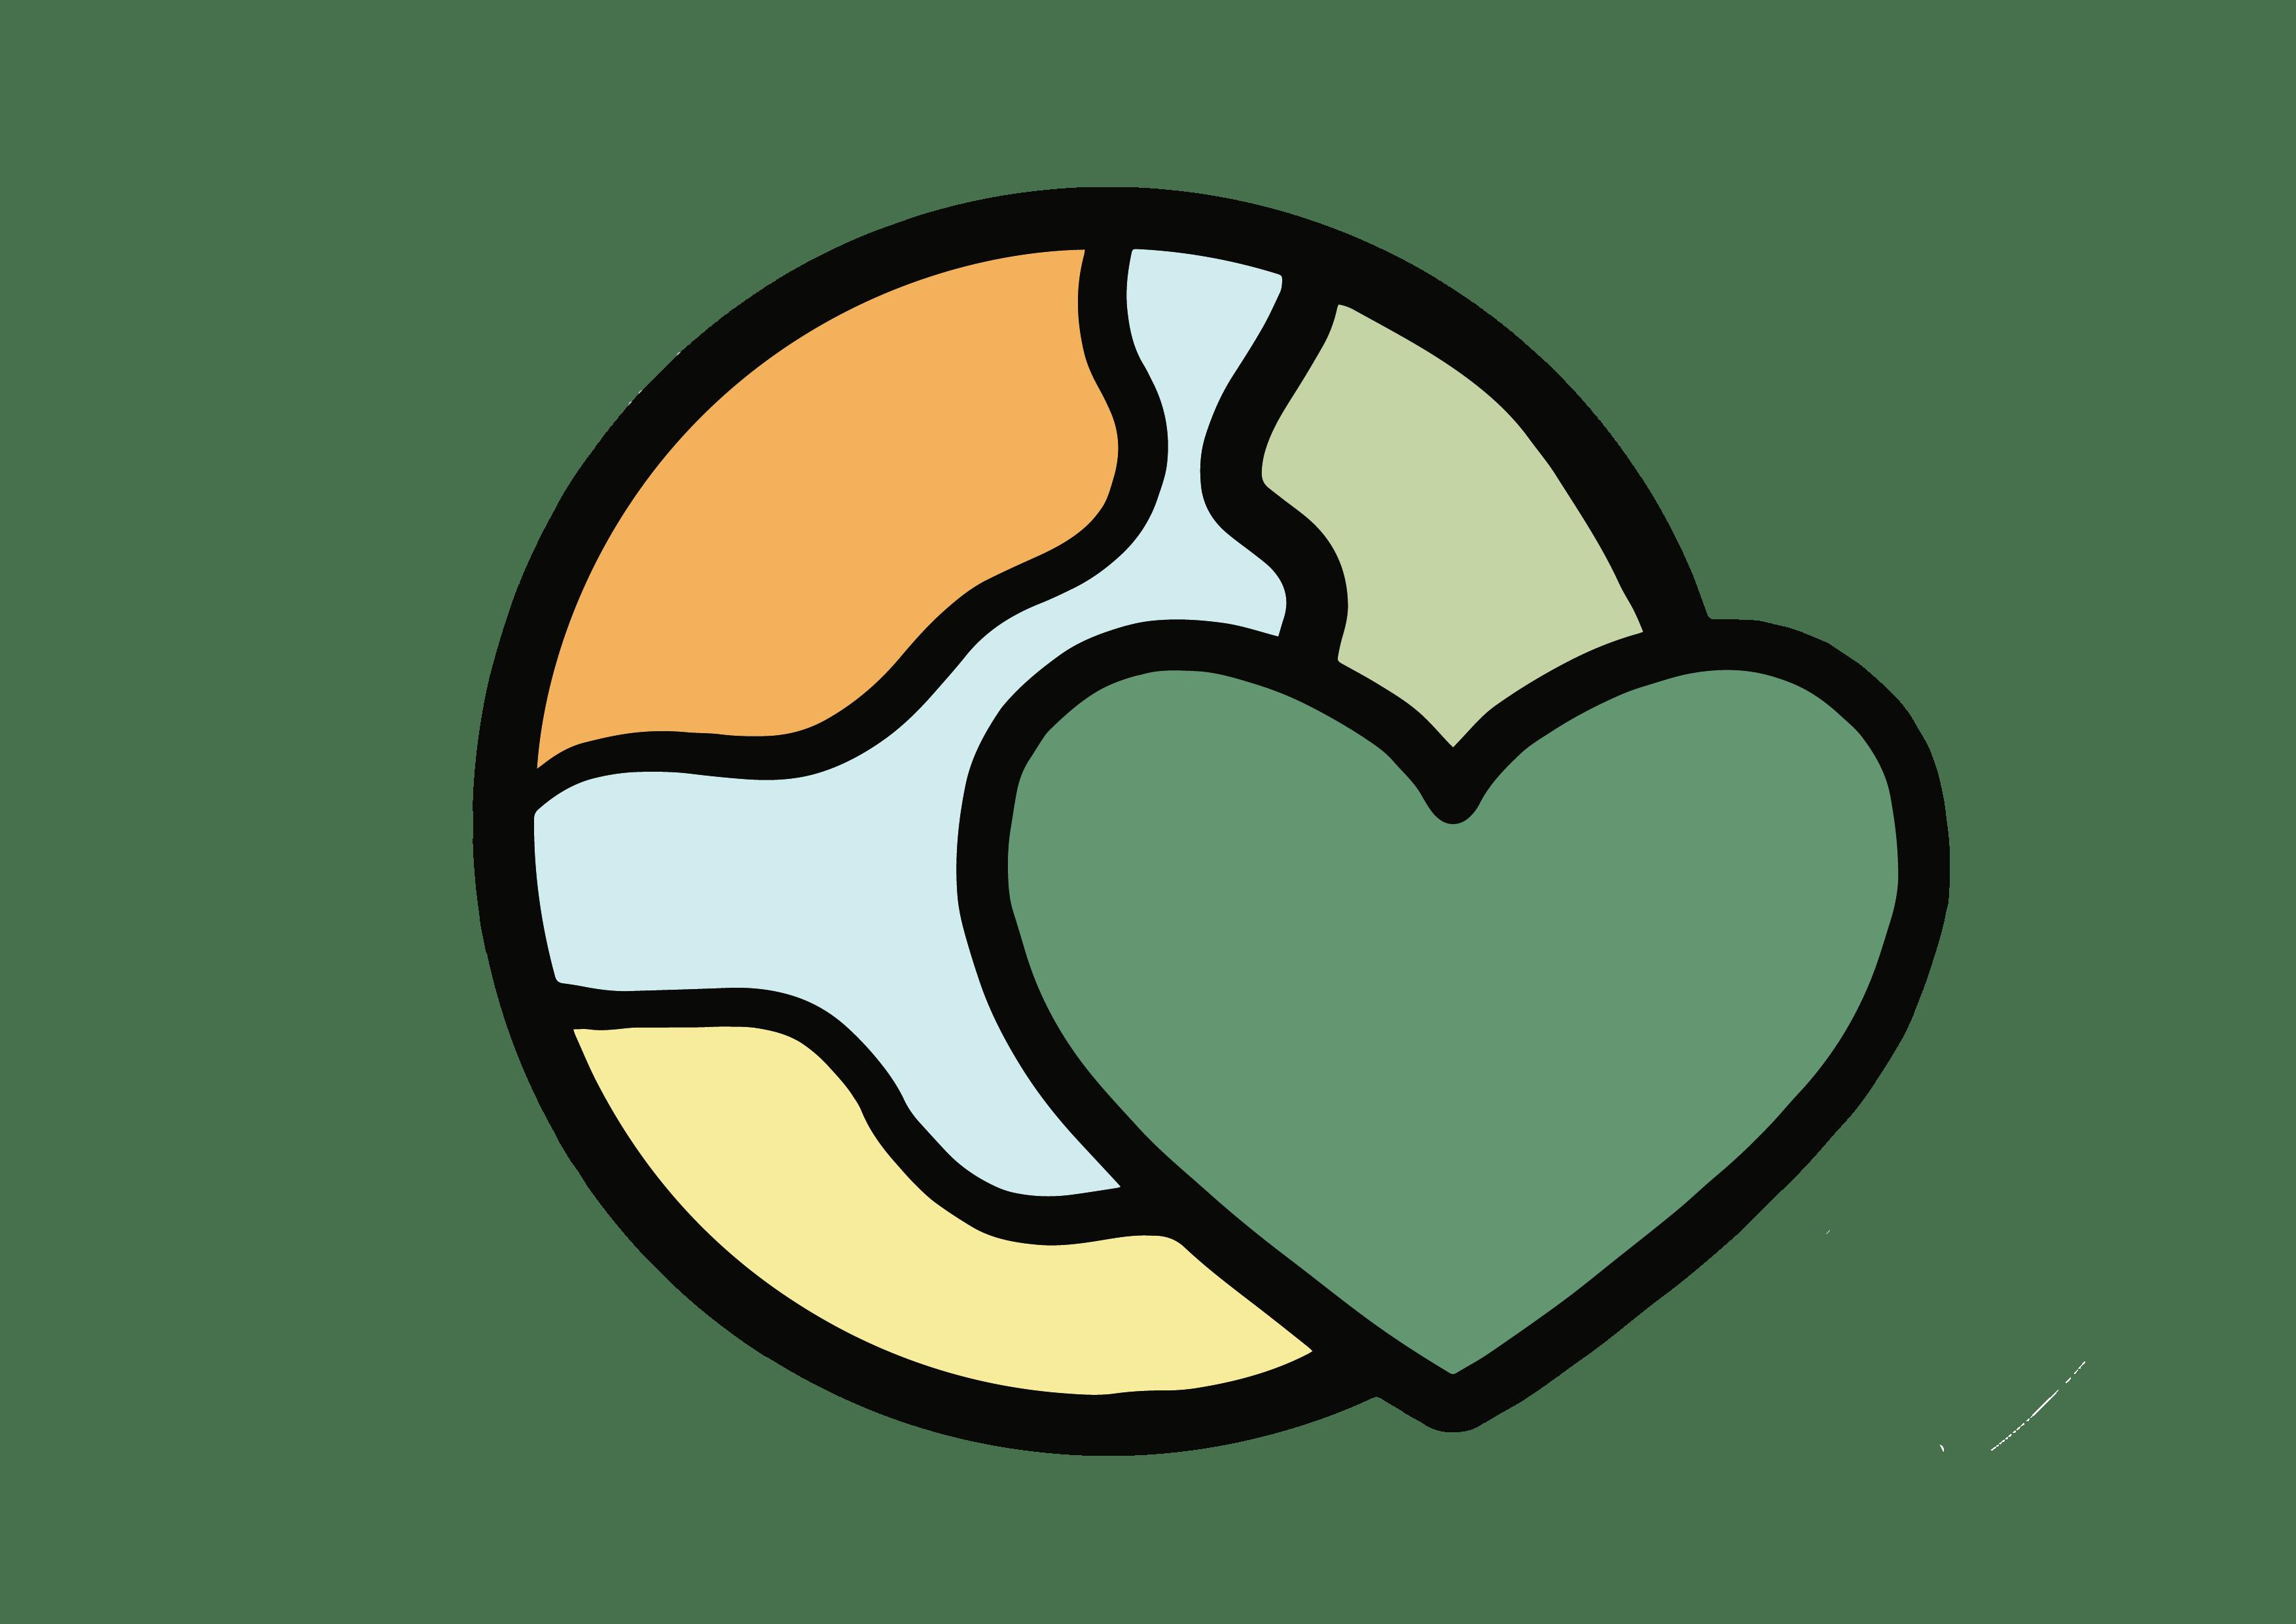 earthLabel.org